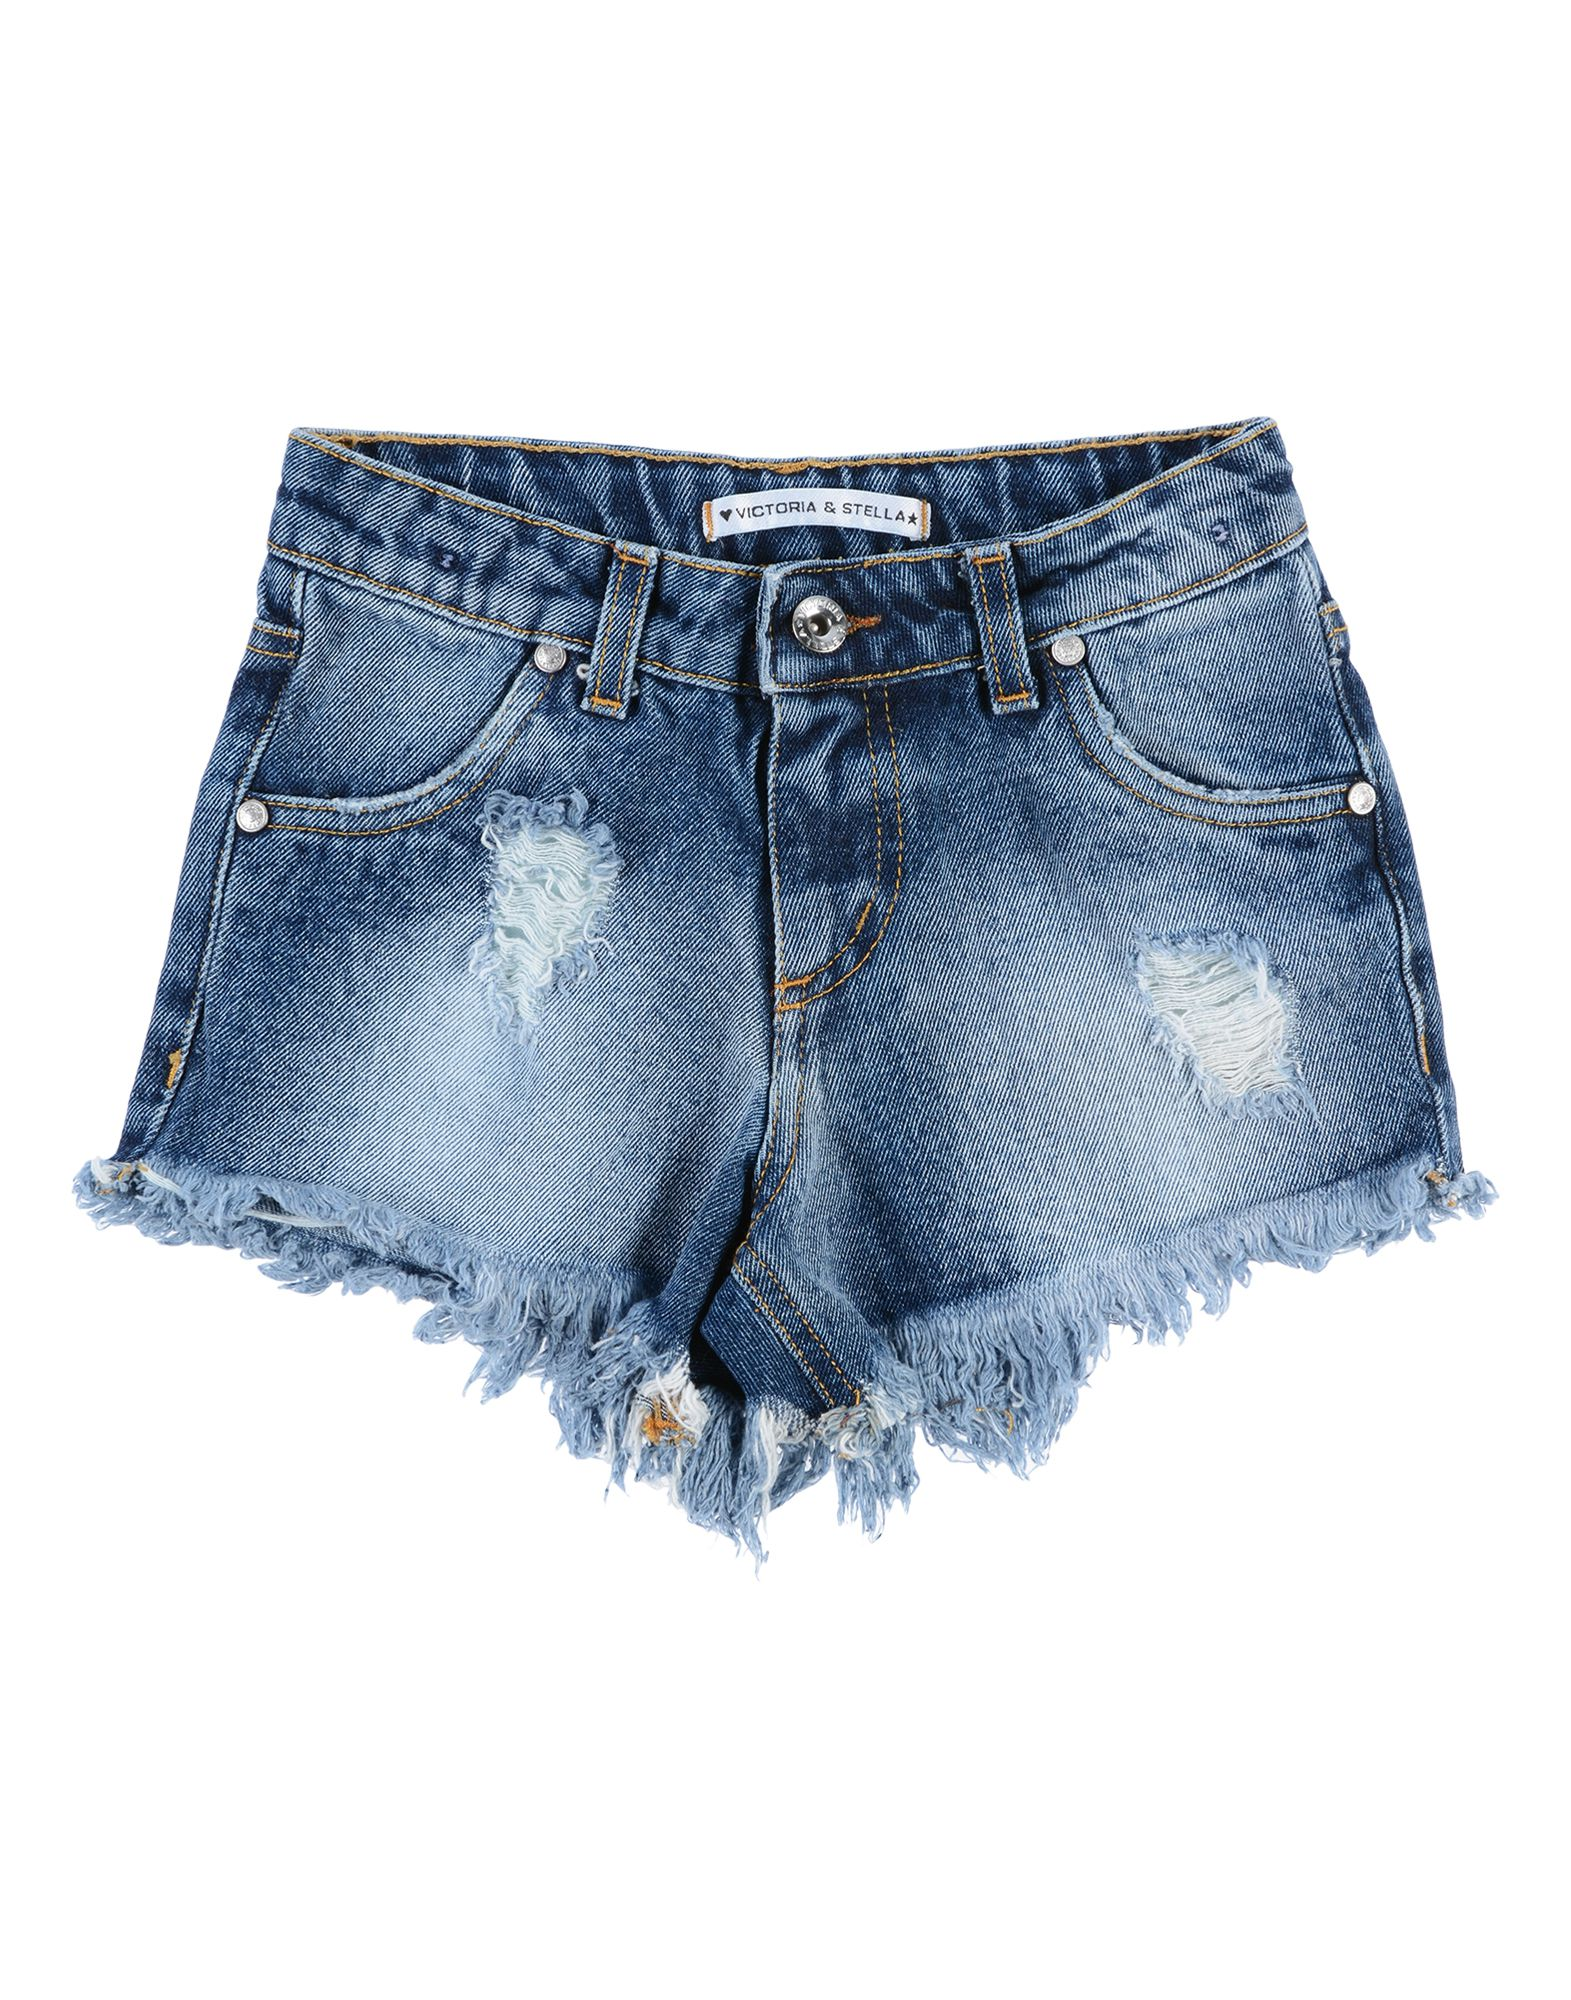 VICTORIA & STELLA Denim shorts - Item 42695753